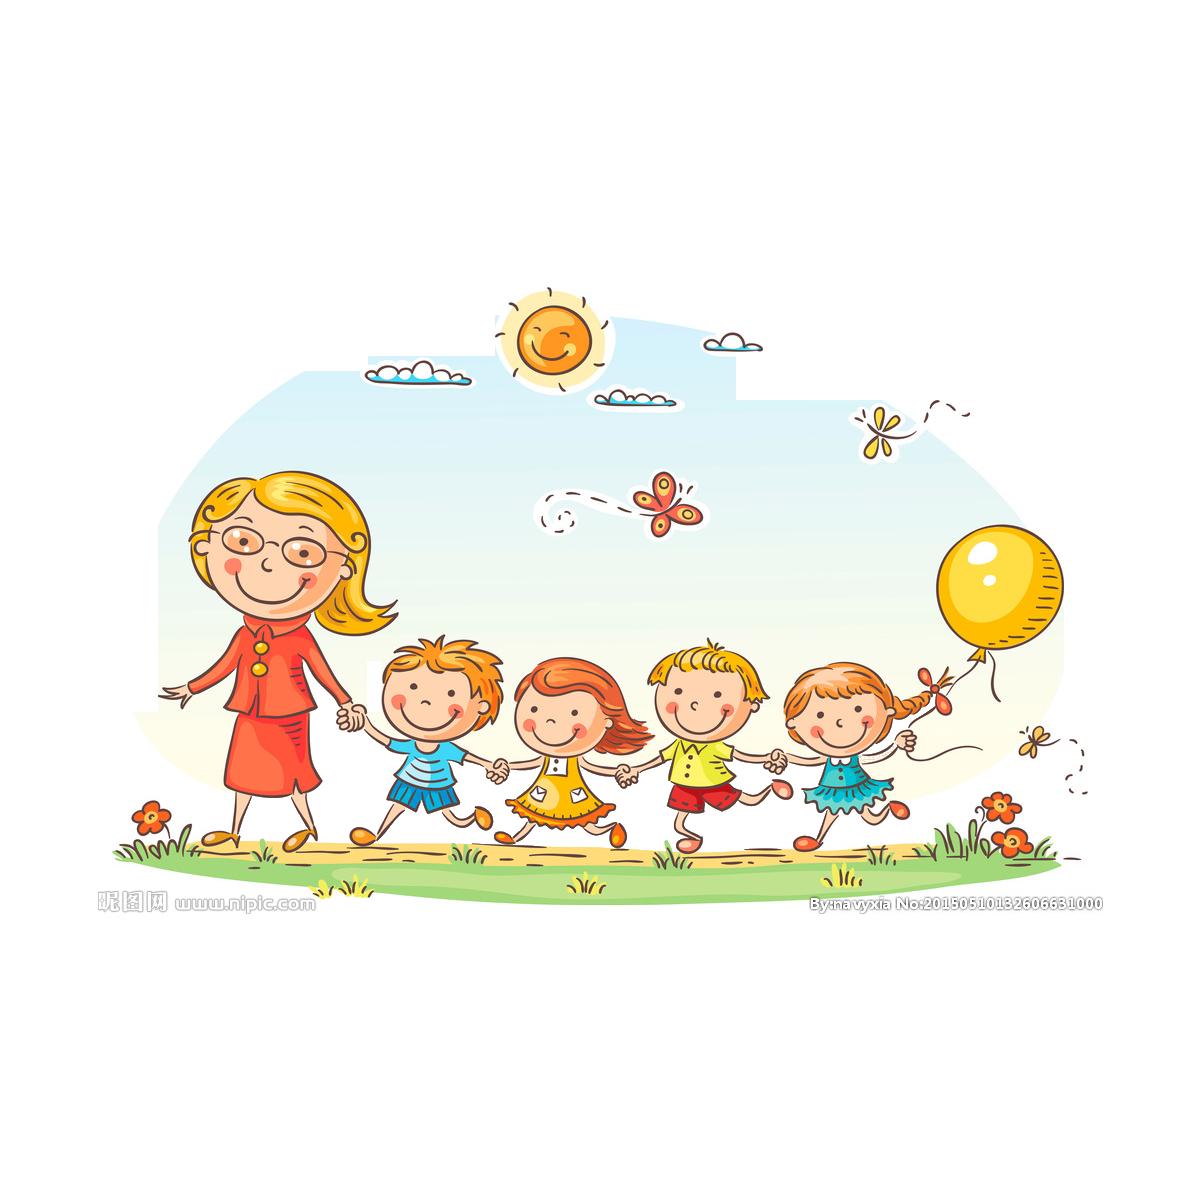 Free school clipart for teachers clip art freeuse download Kindergarten Teacher Pre-school Clip art - child 1200*1200 ... clip art freeuse download